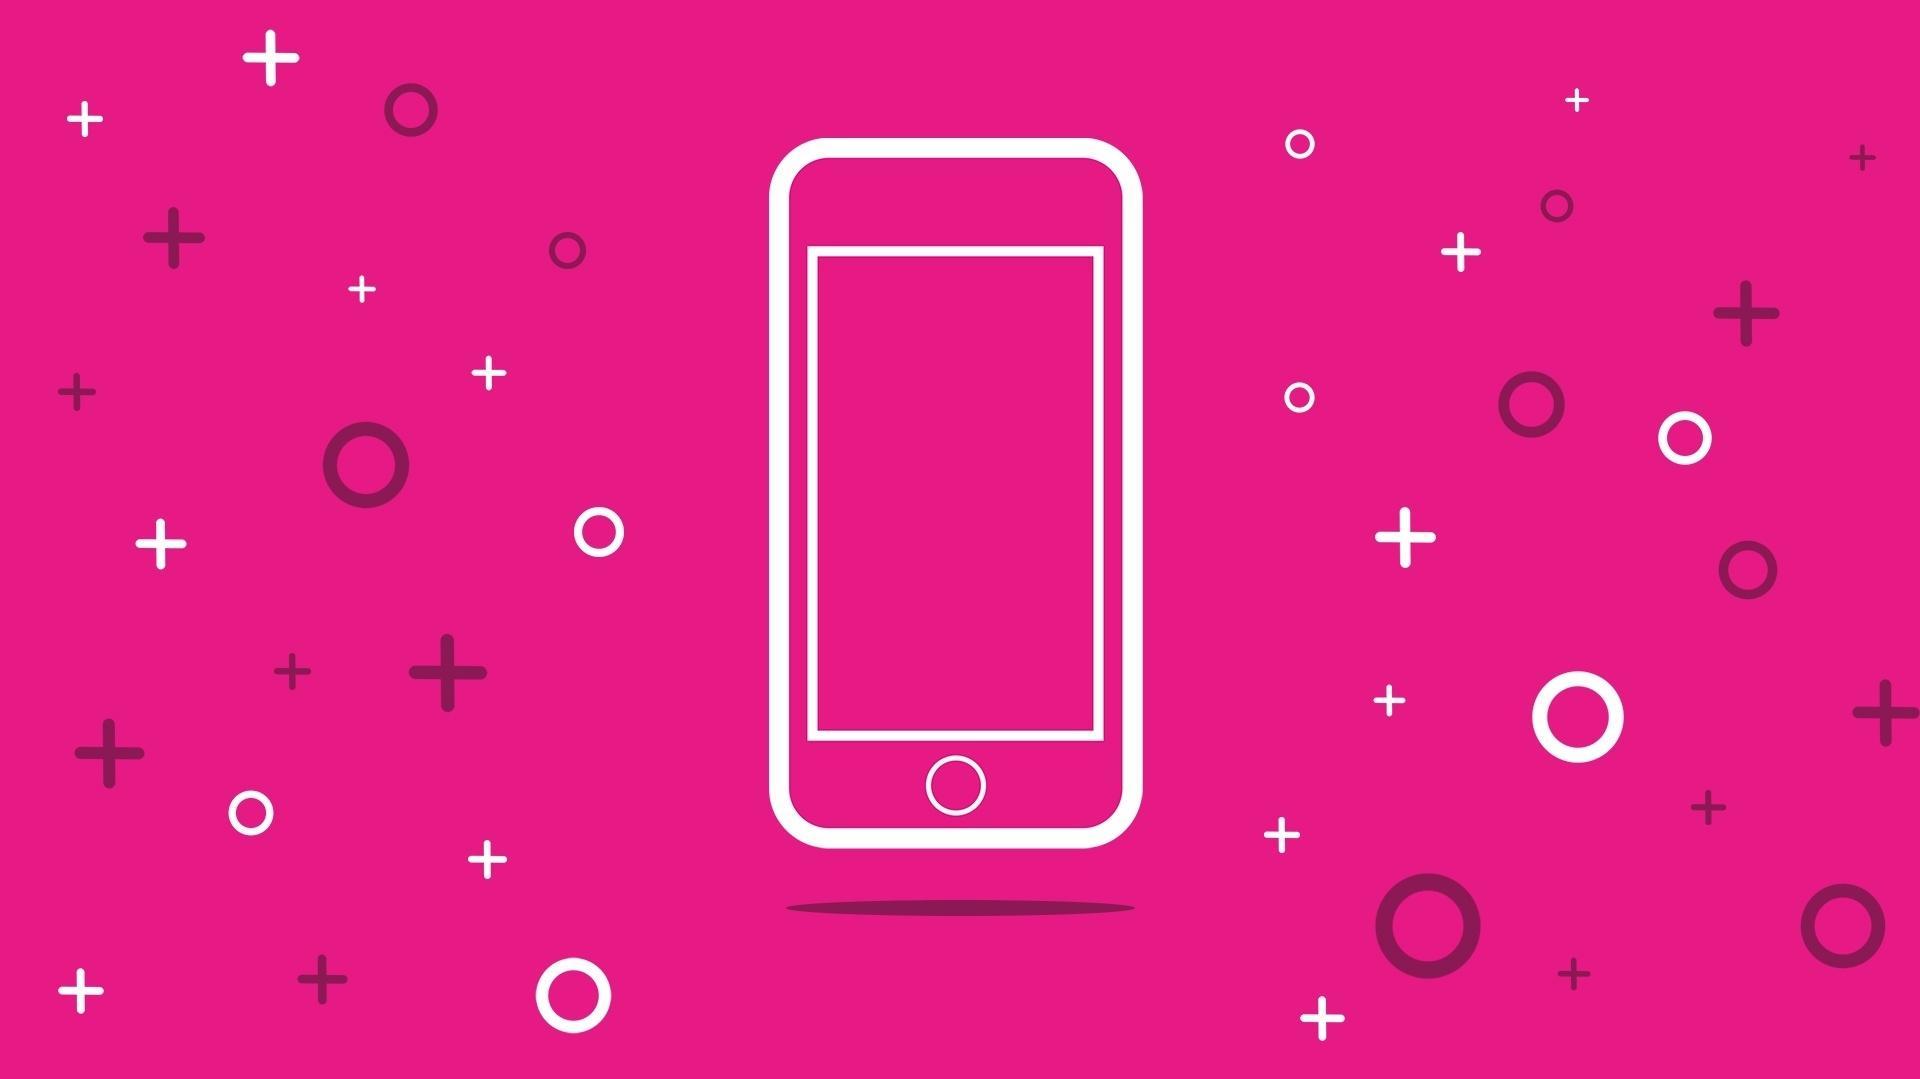 iphone orten t-mobile